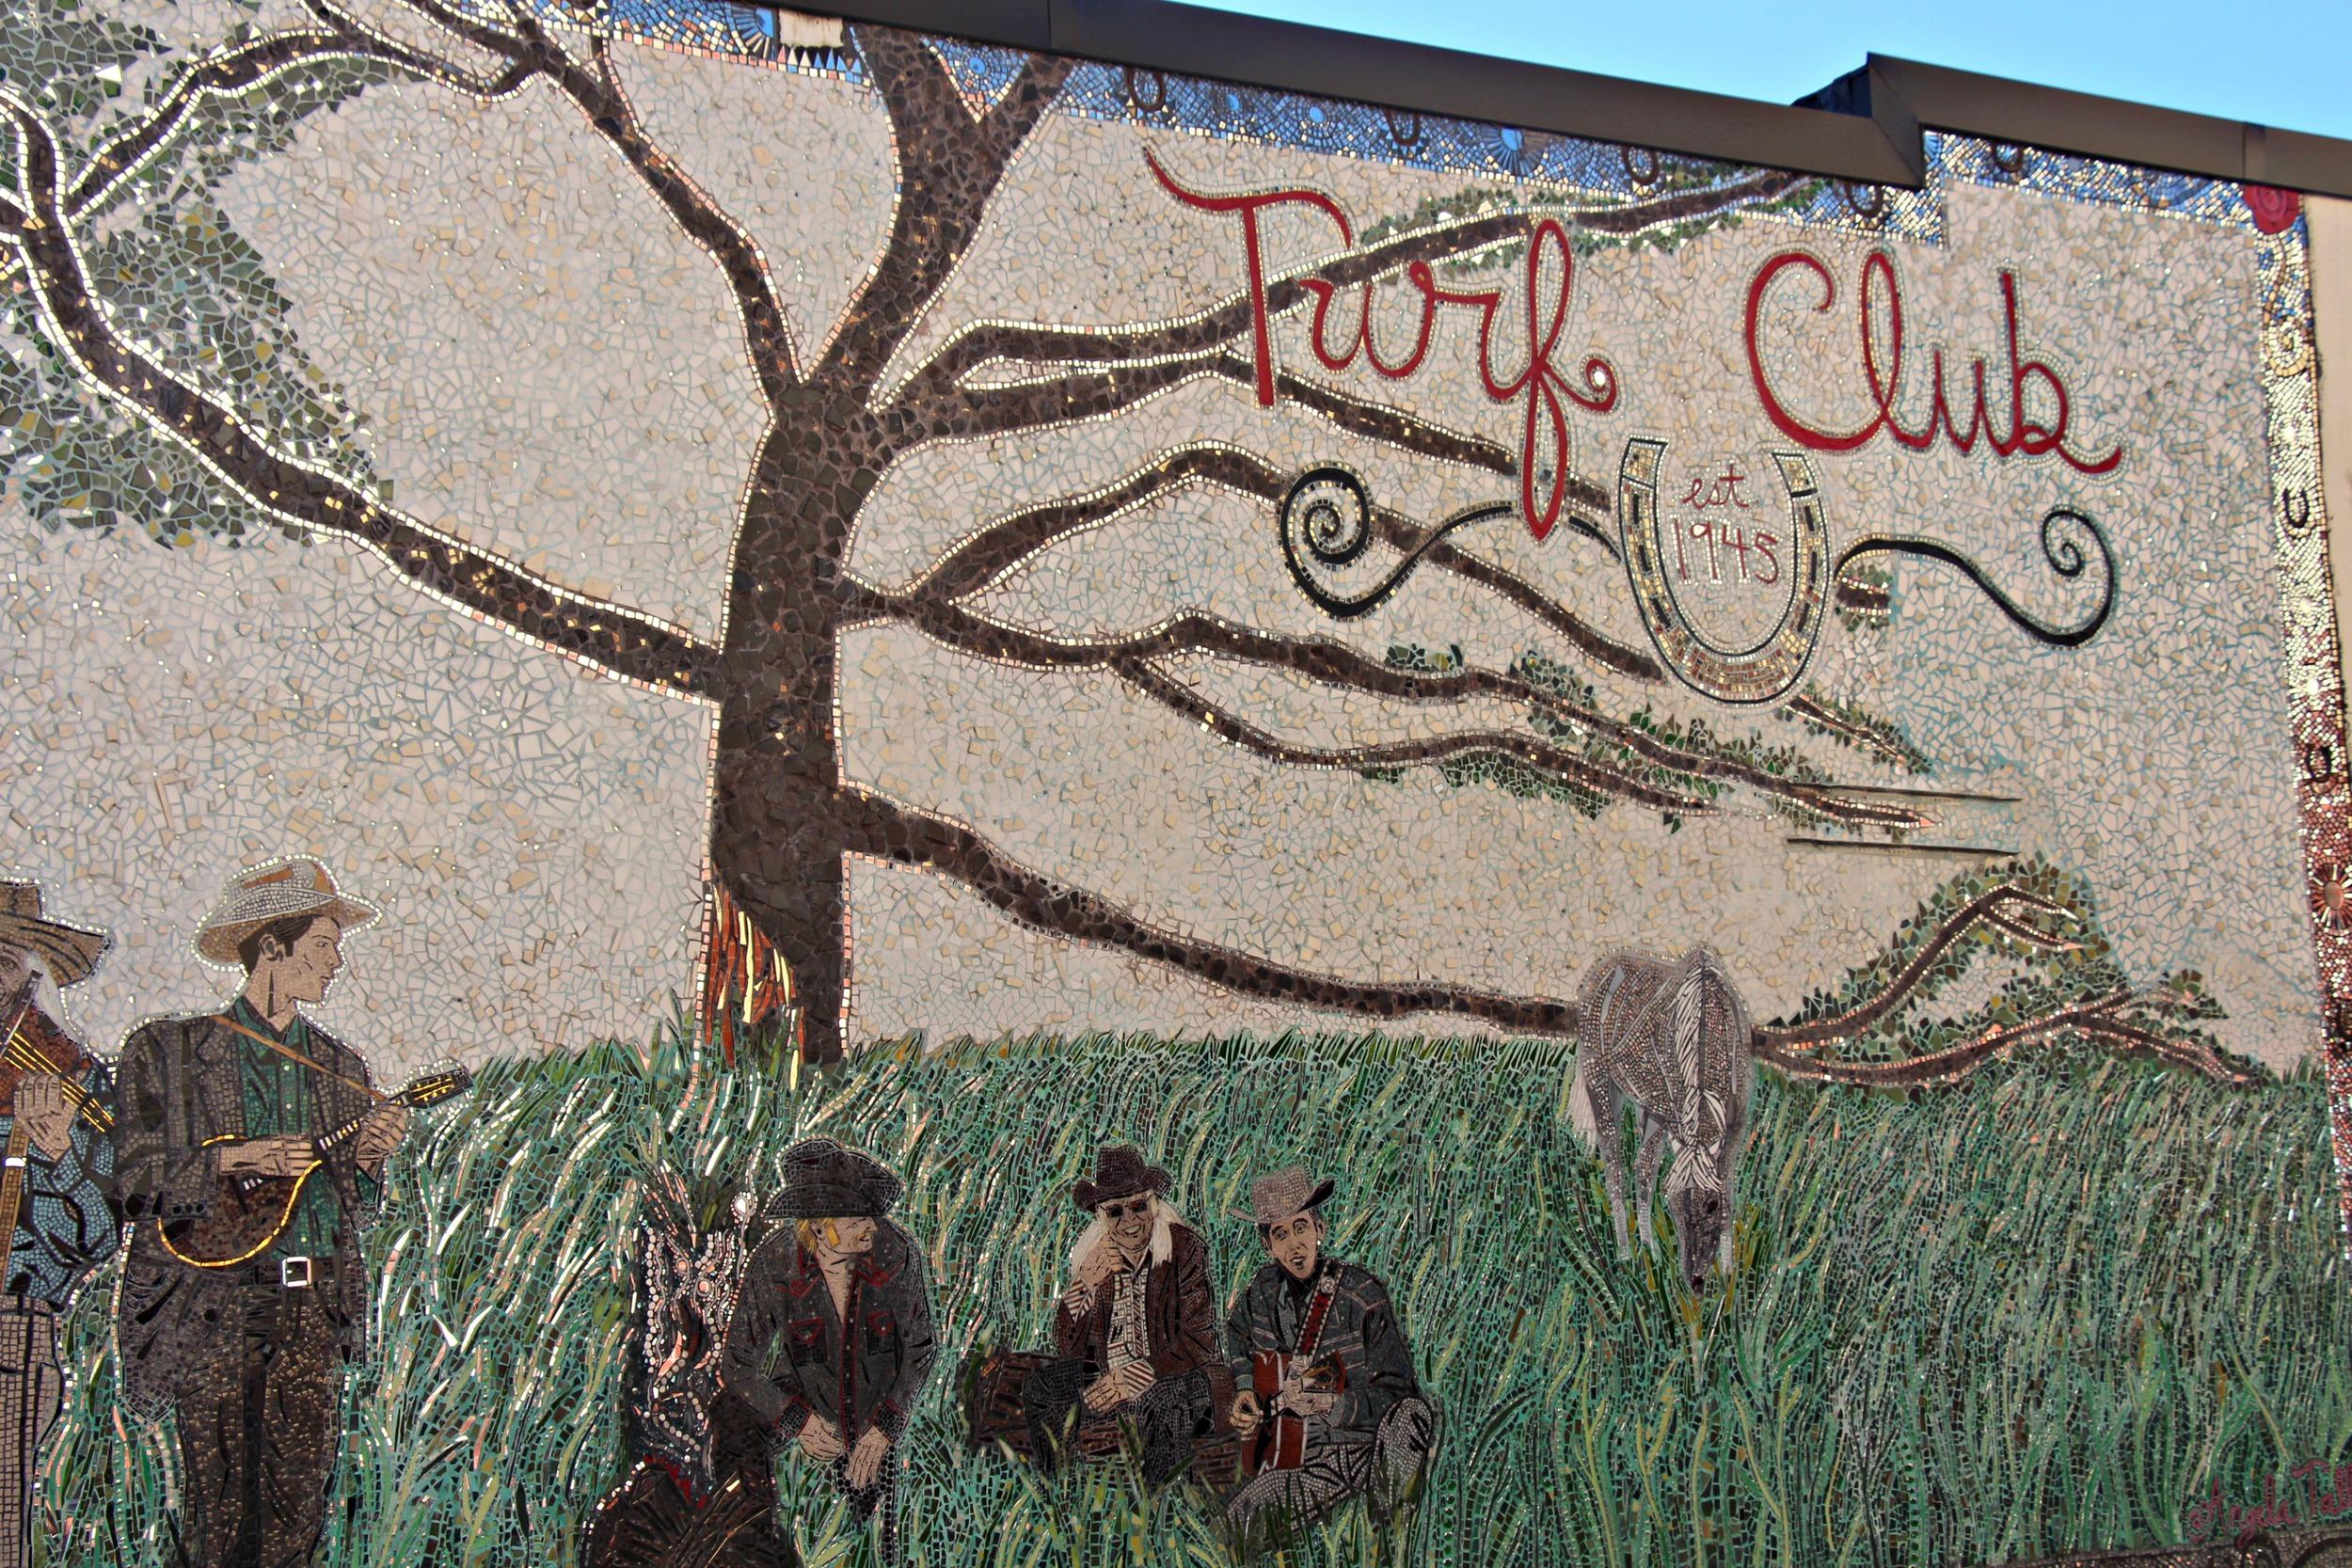 Turf Club Mosaic in St. Paul